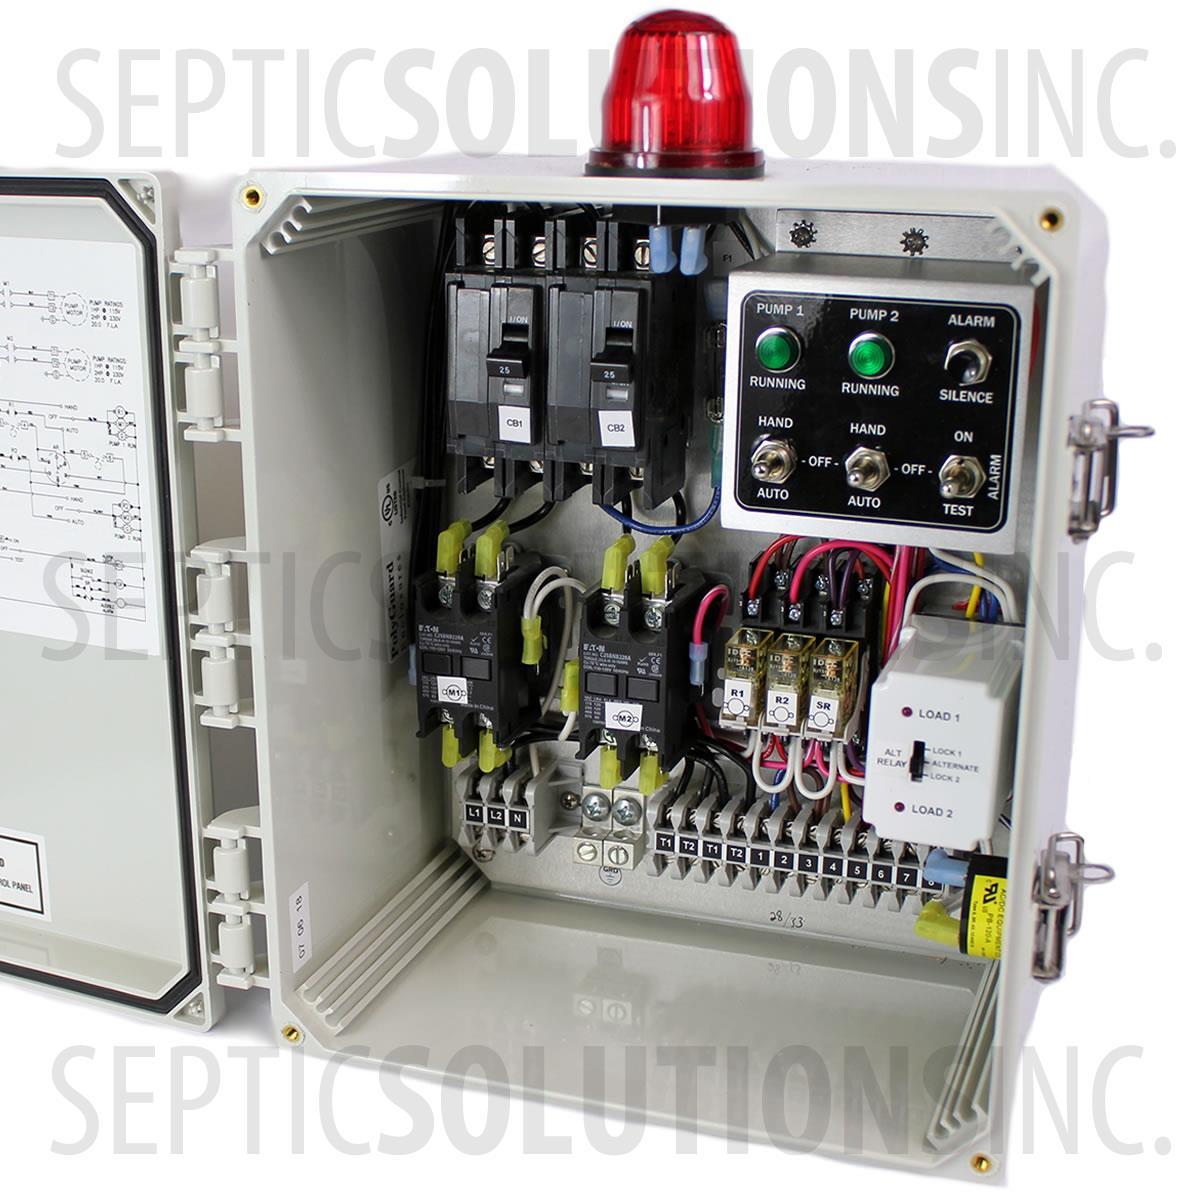 myers duplex pump control panel wiring diagram 1 wiring diagram duplex sewage pump control panels free [ 1200 x 1200 Pixel ]